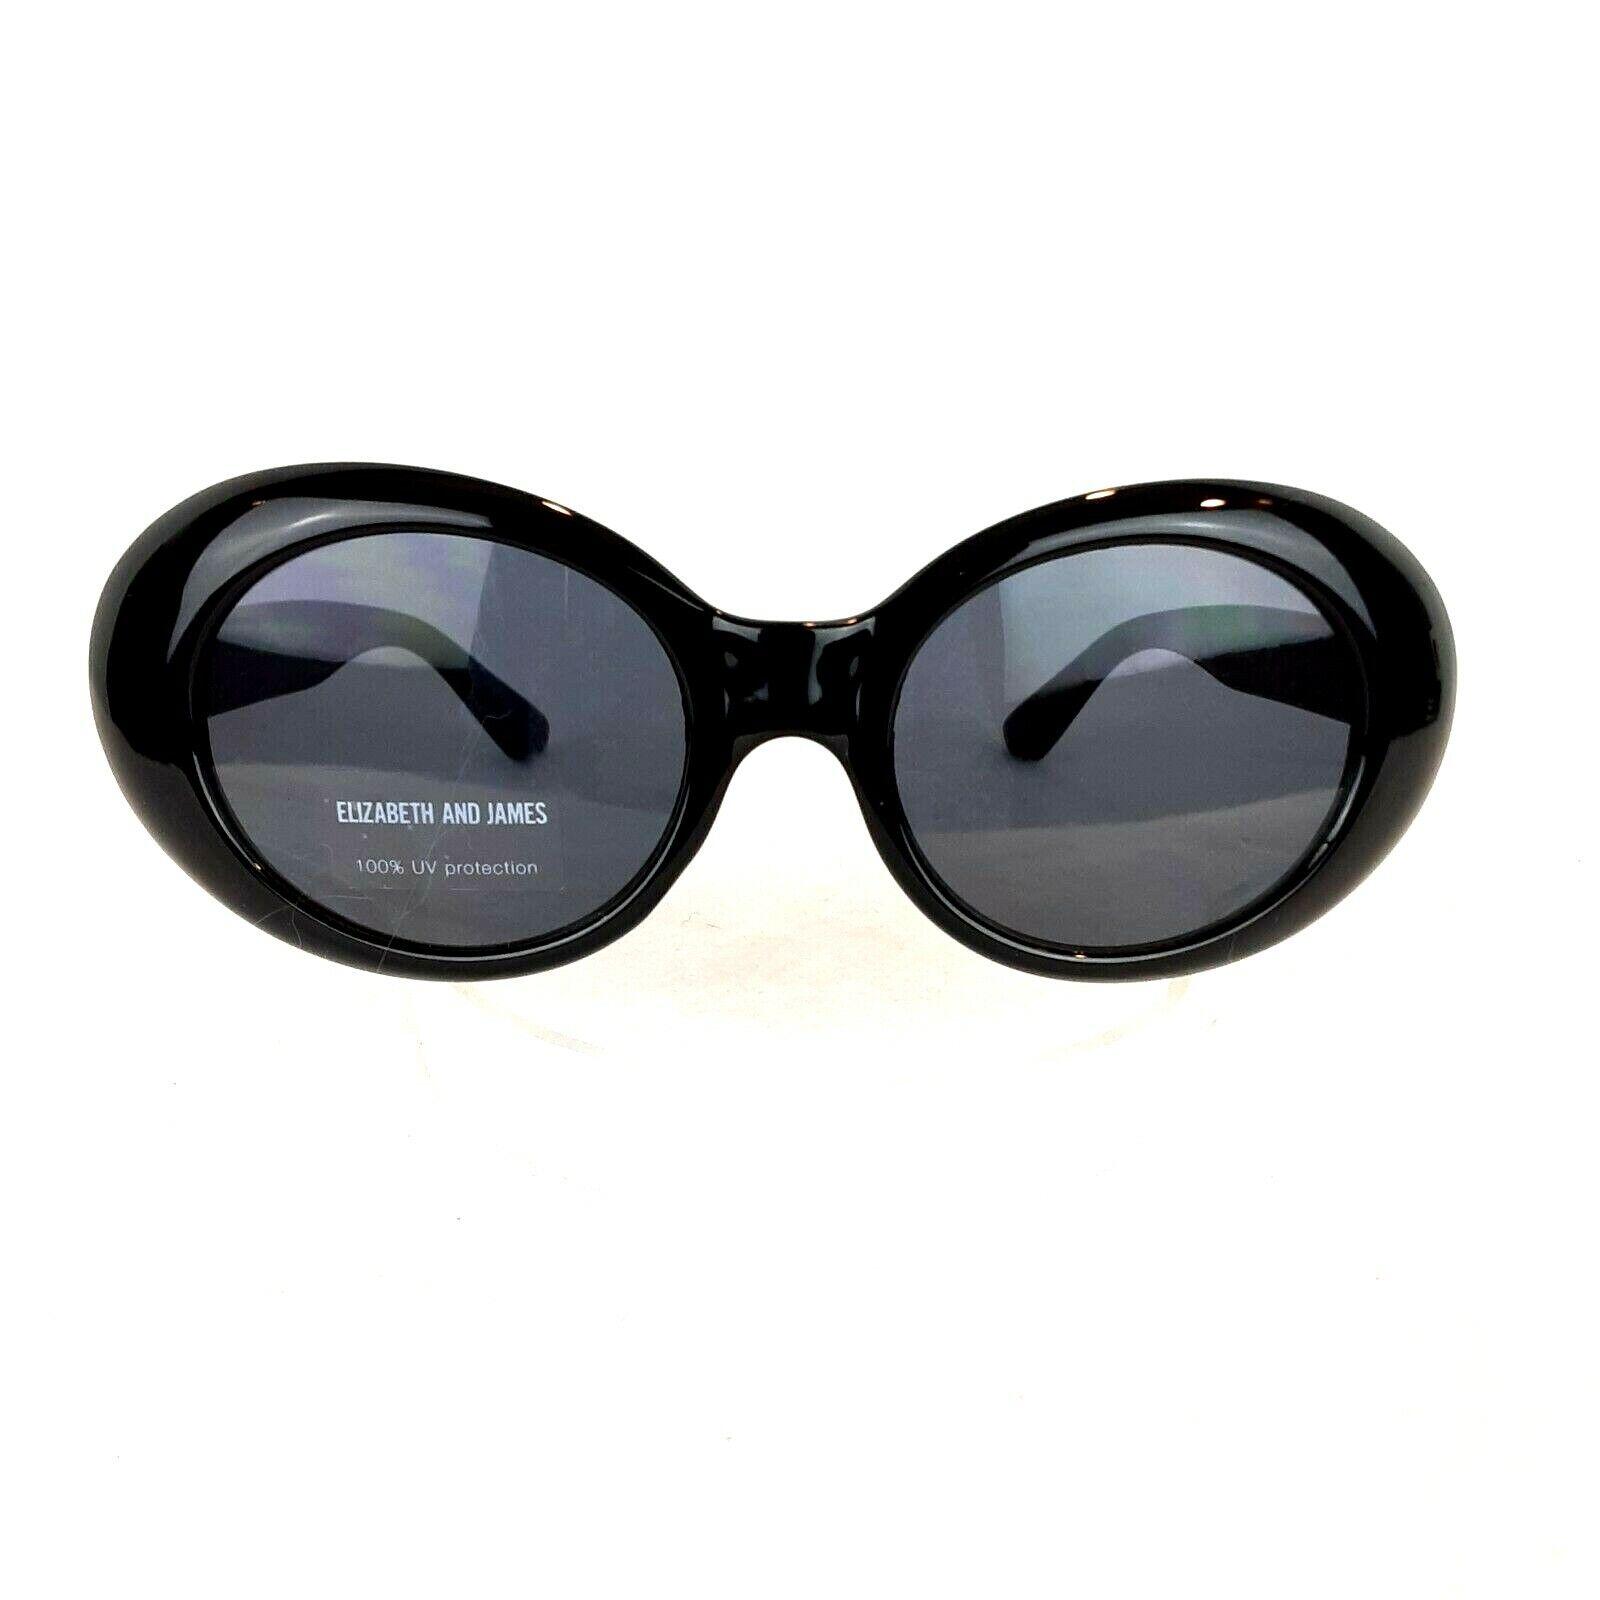 Elizabeth and James Sunglasses Black Cat Eye Women's